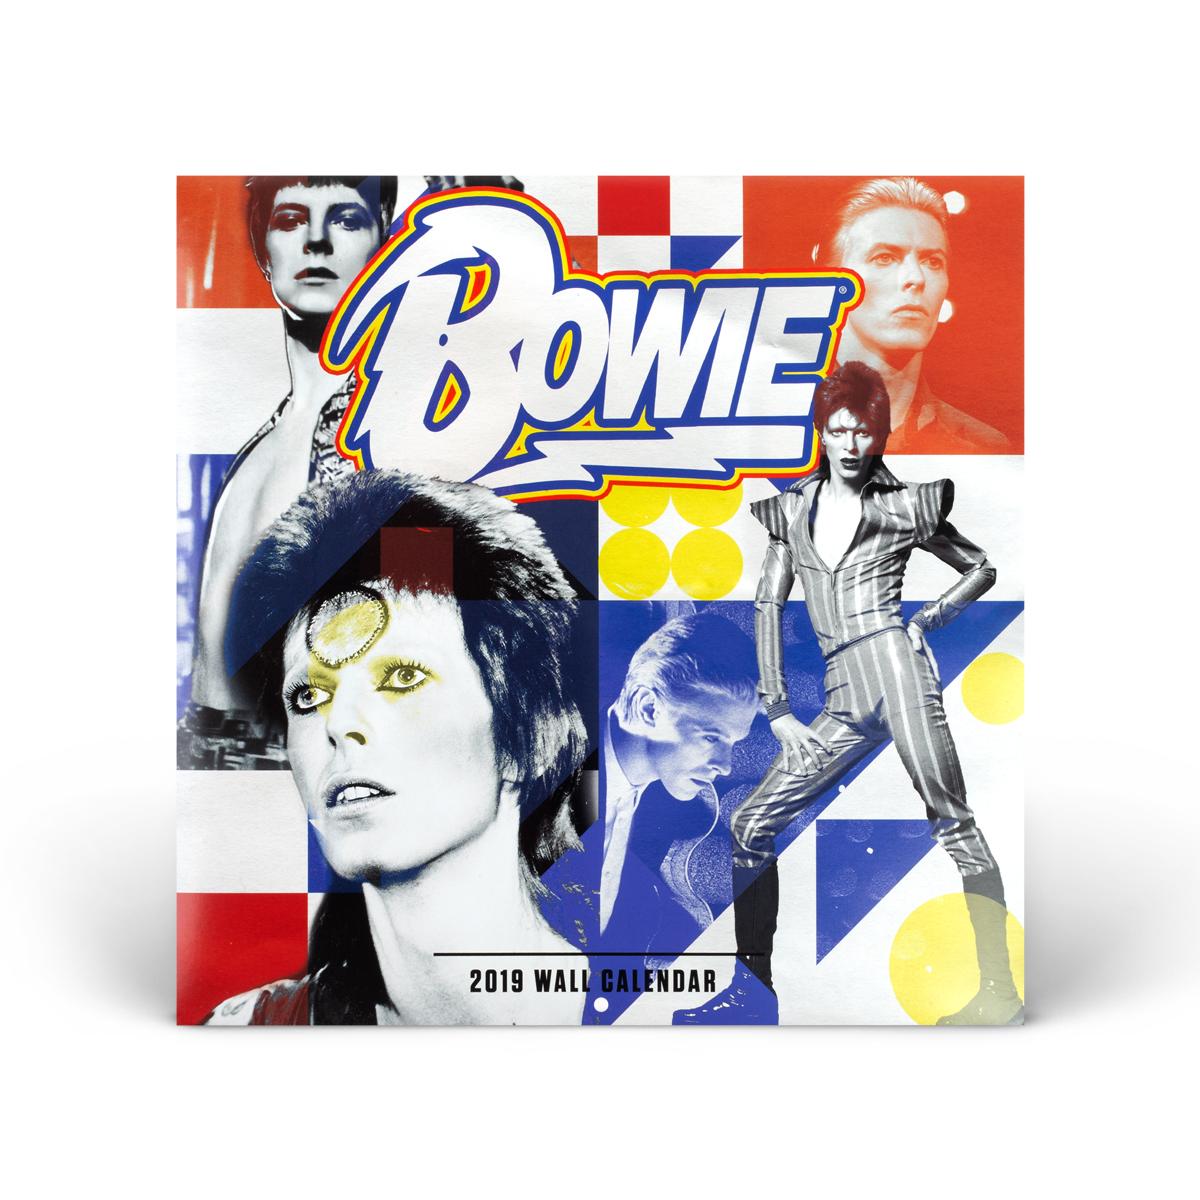 David Bowie 2019 Wall Calendar